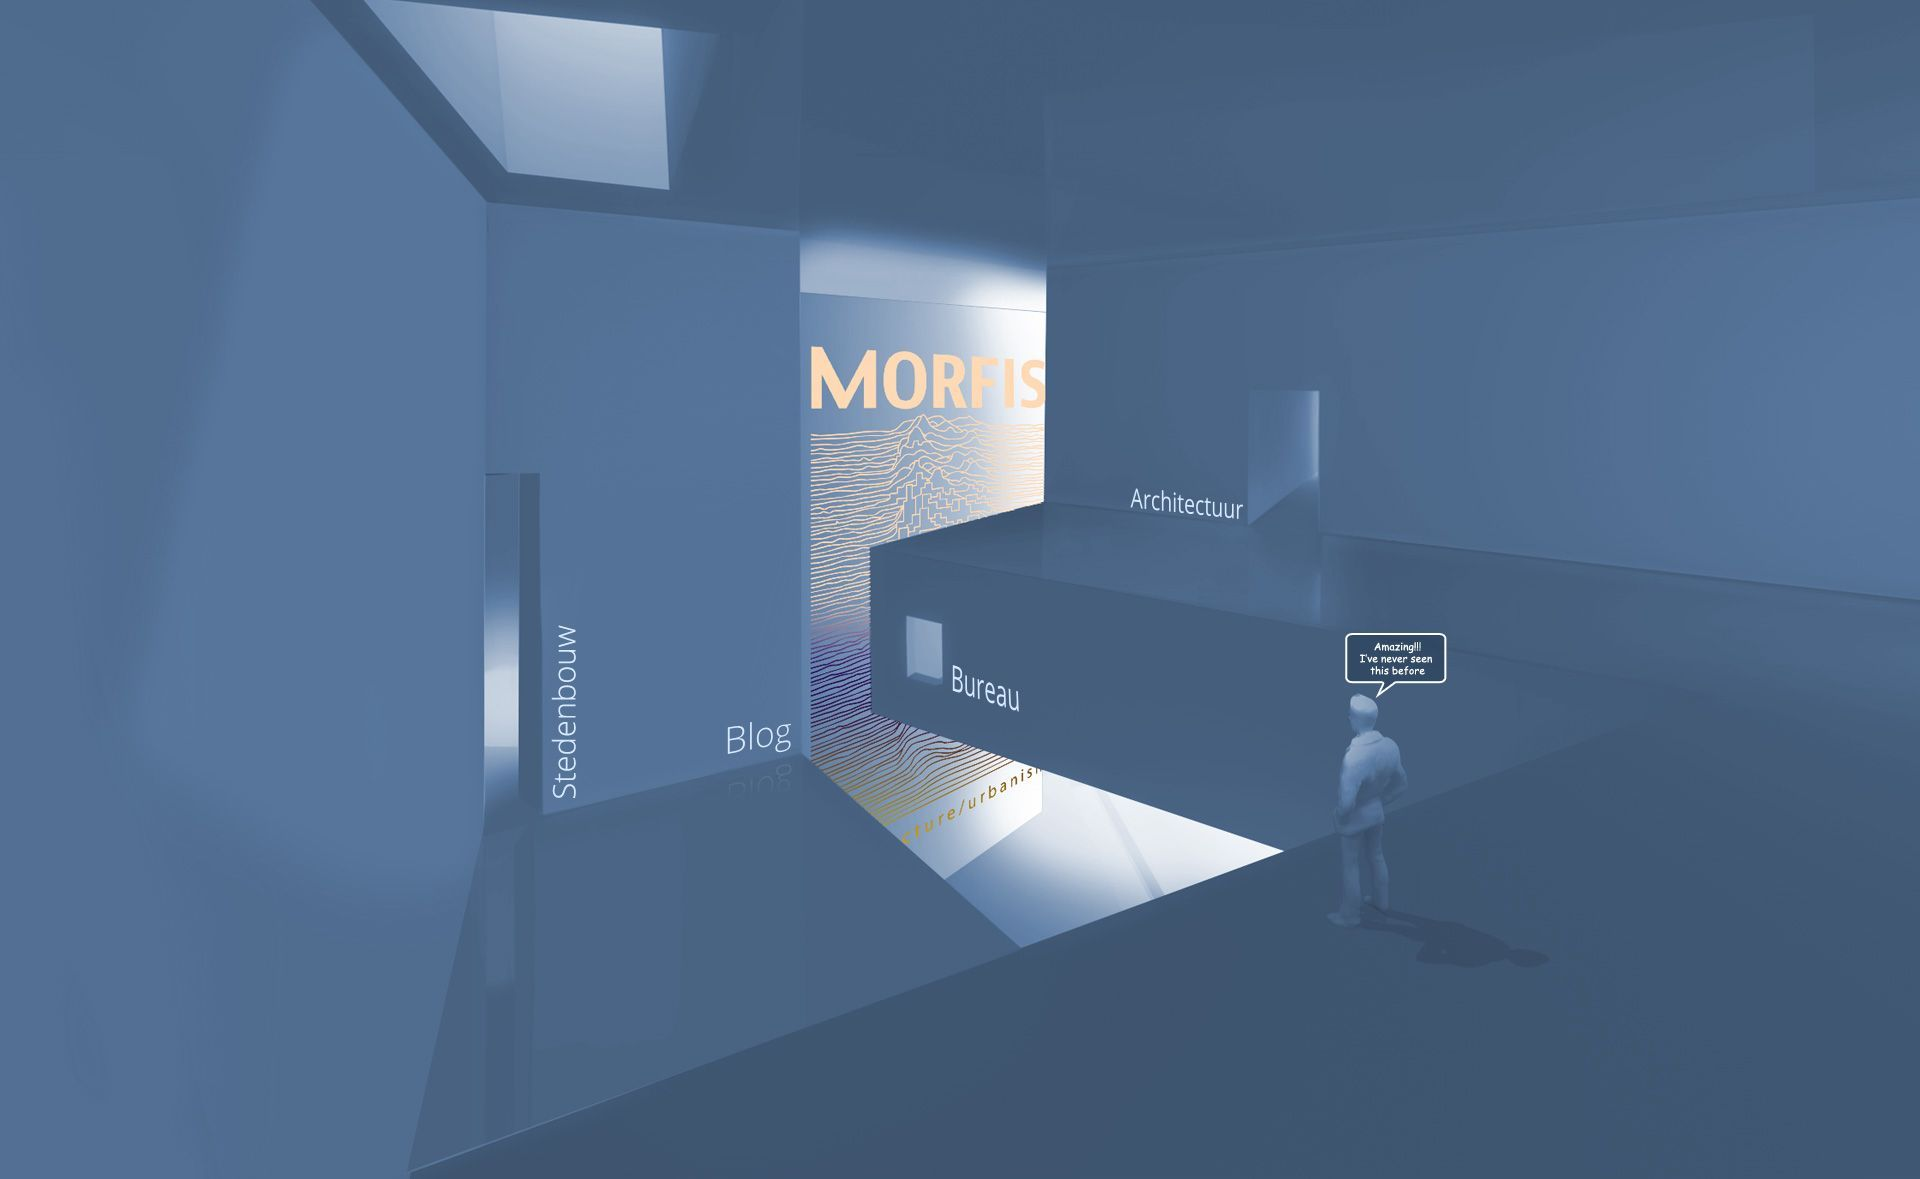 Morfis architecture and urbanism u monkey republic